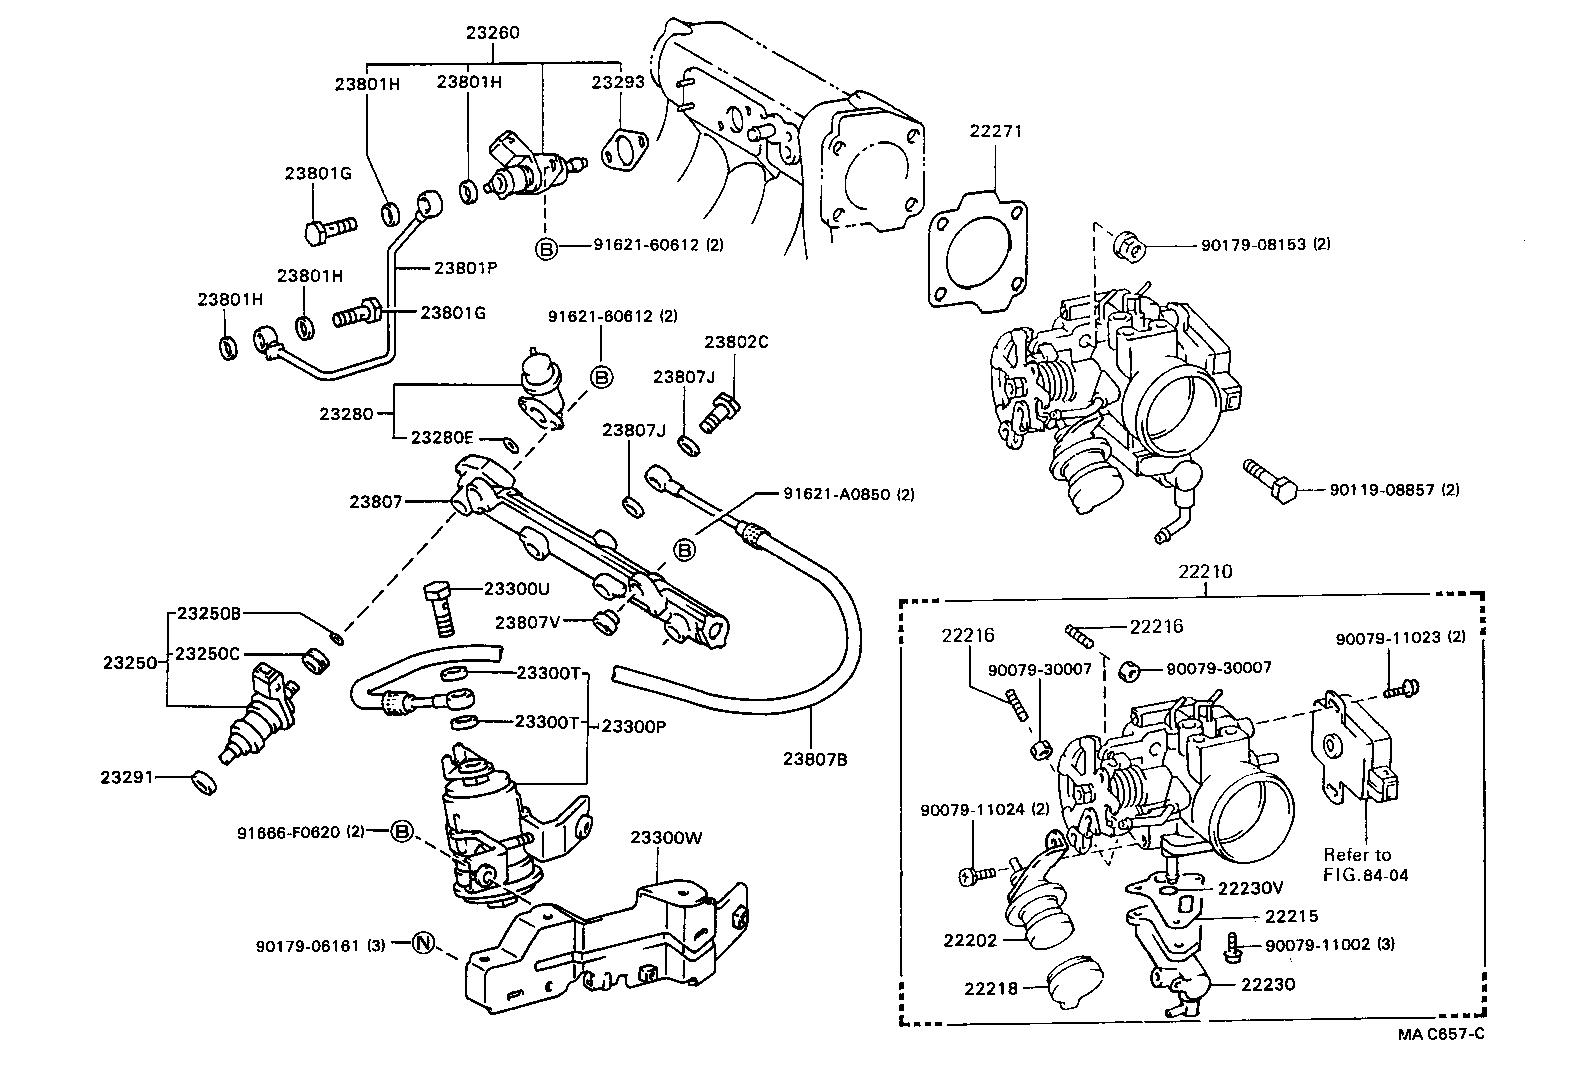 1992 Toyota Paseo Fuel Pump Wiring Diagram. Toyota. Auto